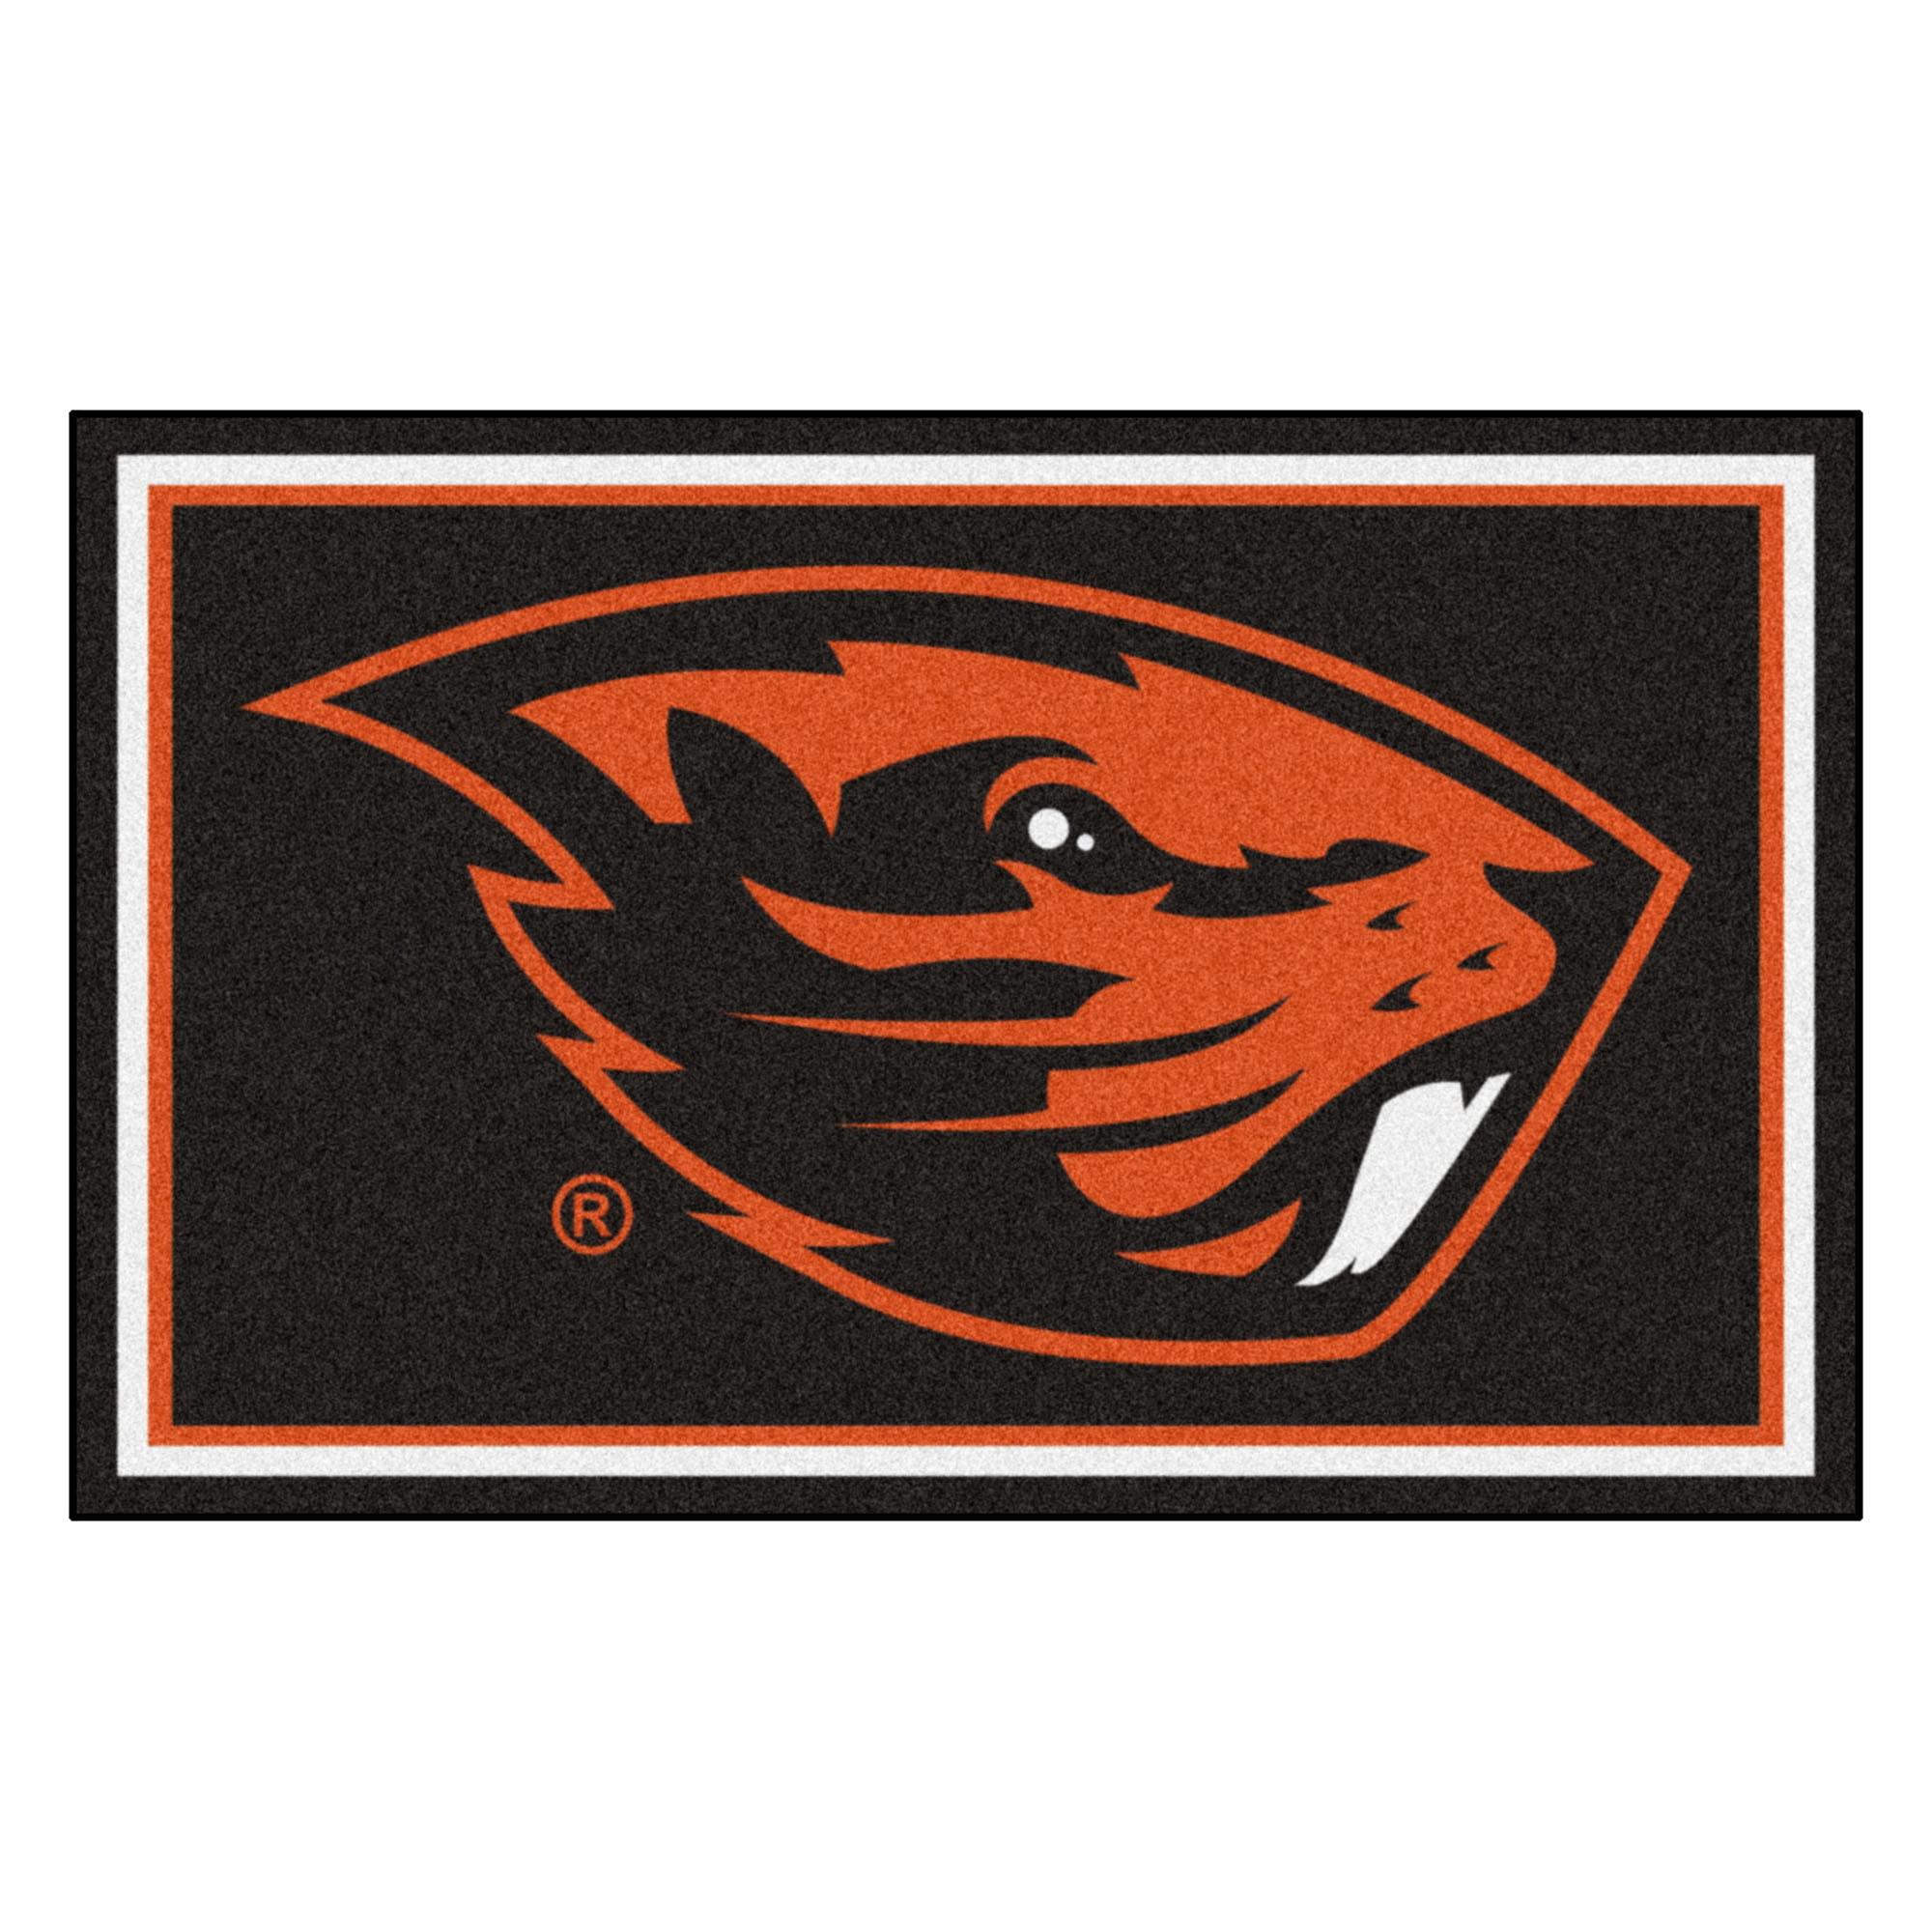 20242 Fanmats College NCAA Oregon State University 44 Inch x 71 Inch Non-skid Nylon carpet Face Chromojet printed 4x6 Plush Rug